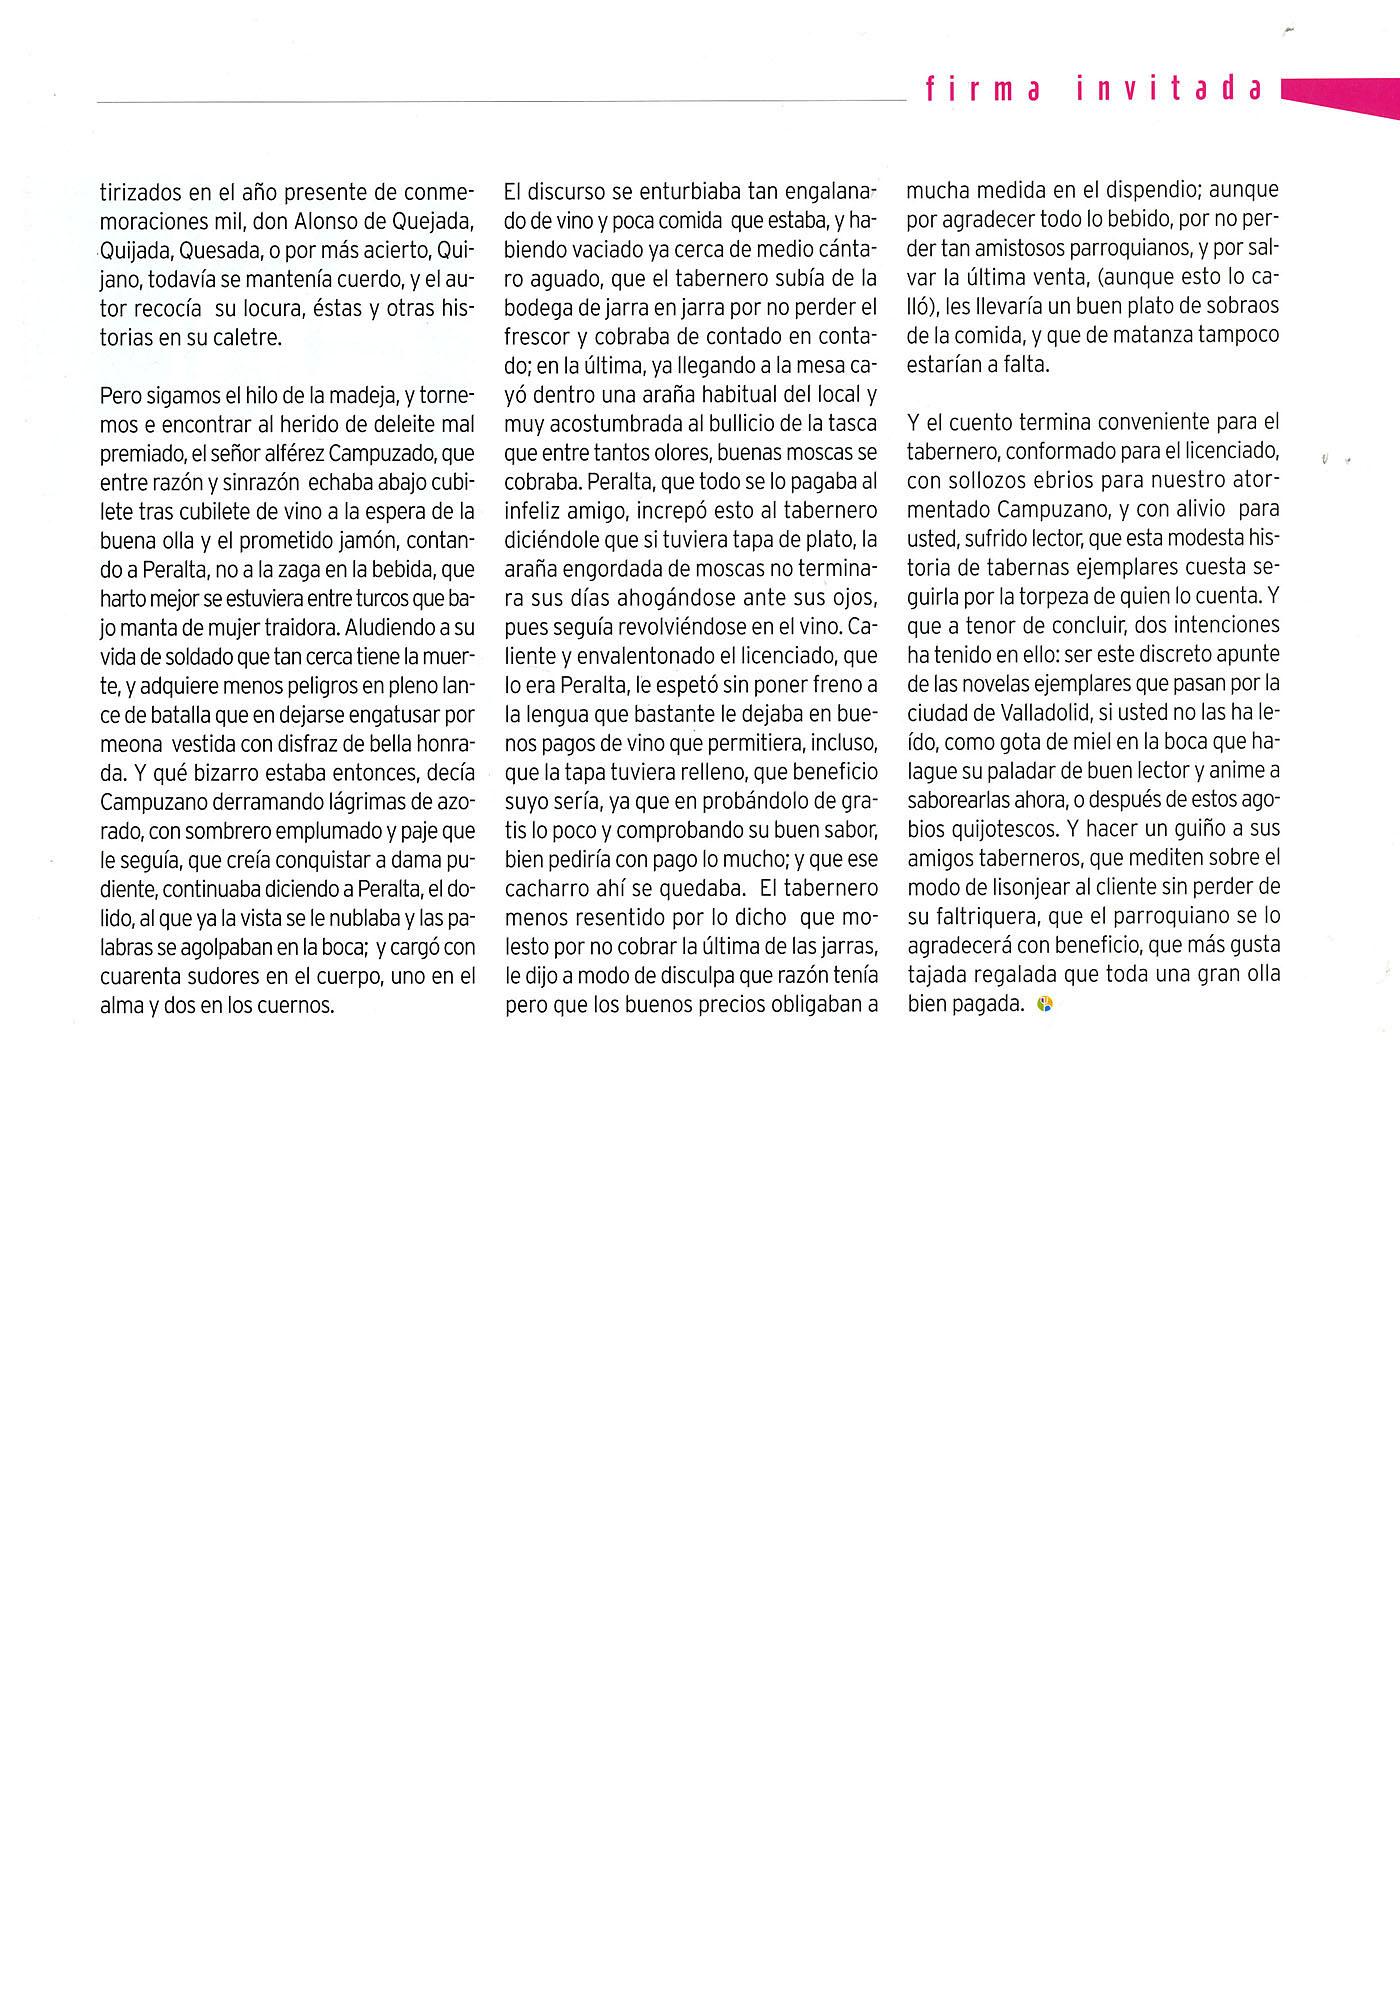 danielvillalobos-calderonsamaniego-shortstory-spanishliterature.3